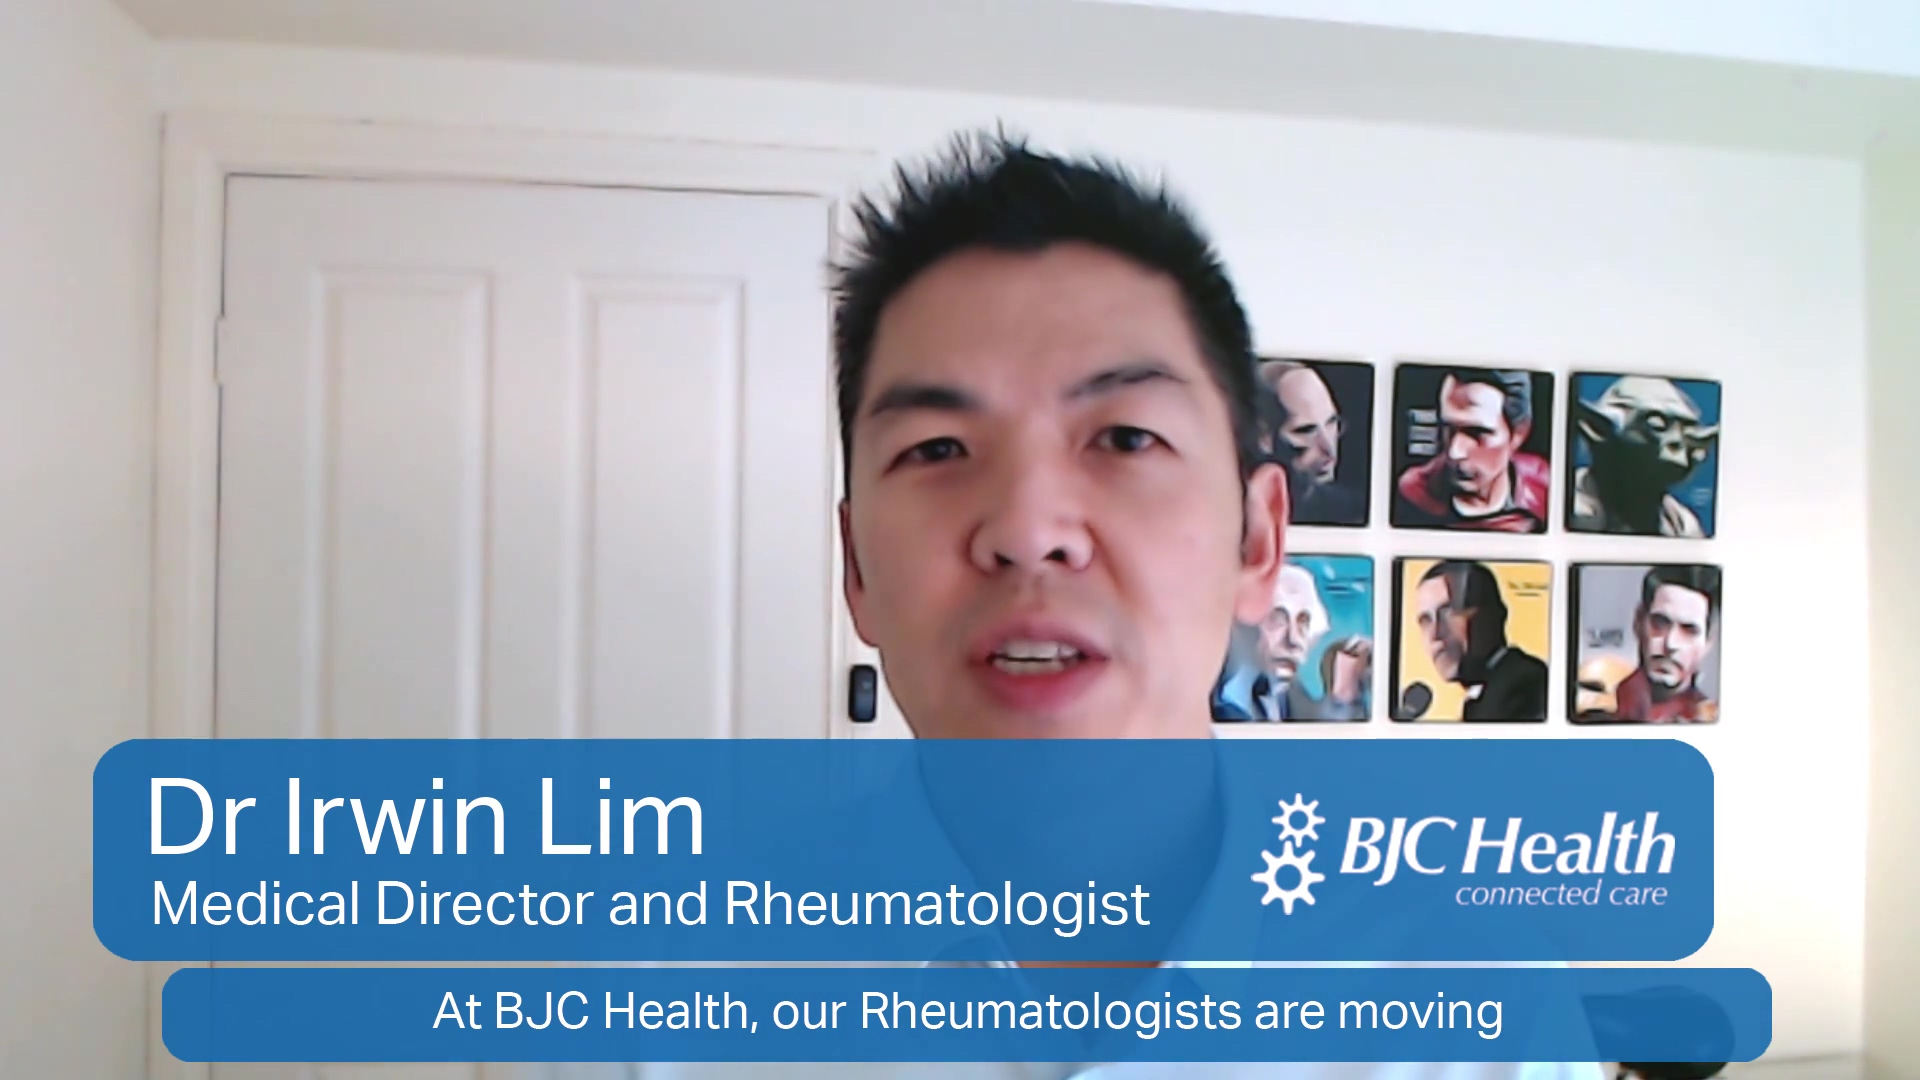 165 How can BJC rheumatologists help using telehealth